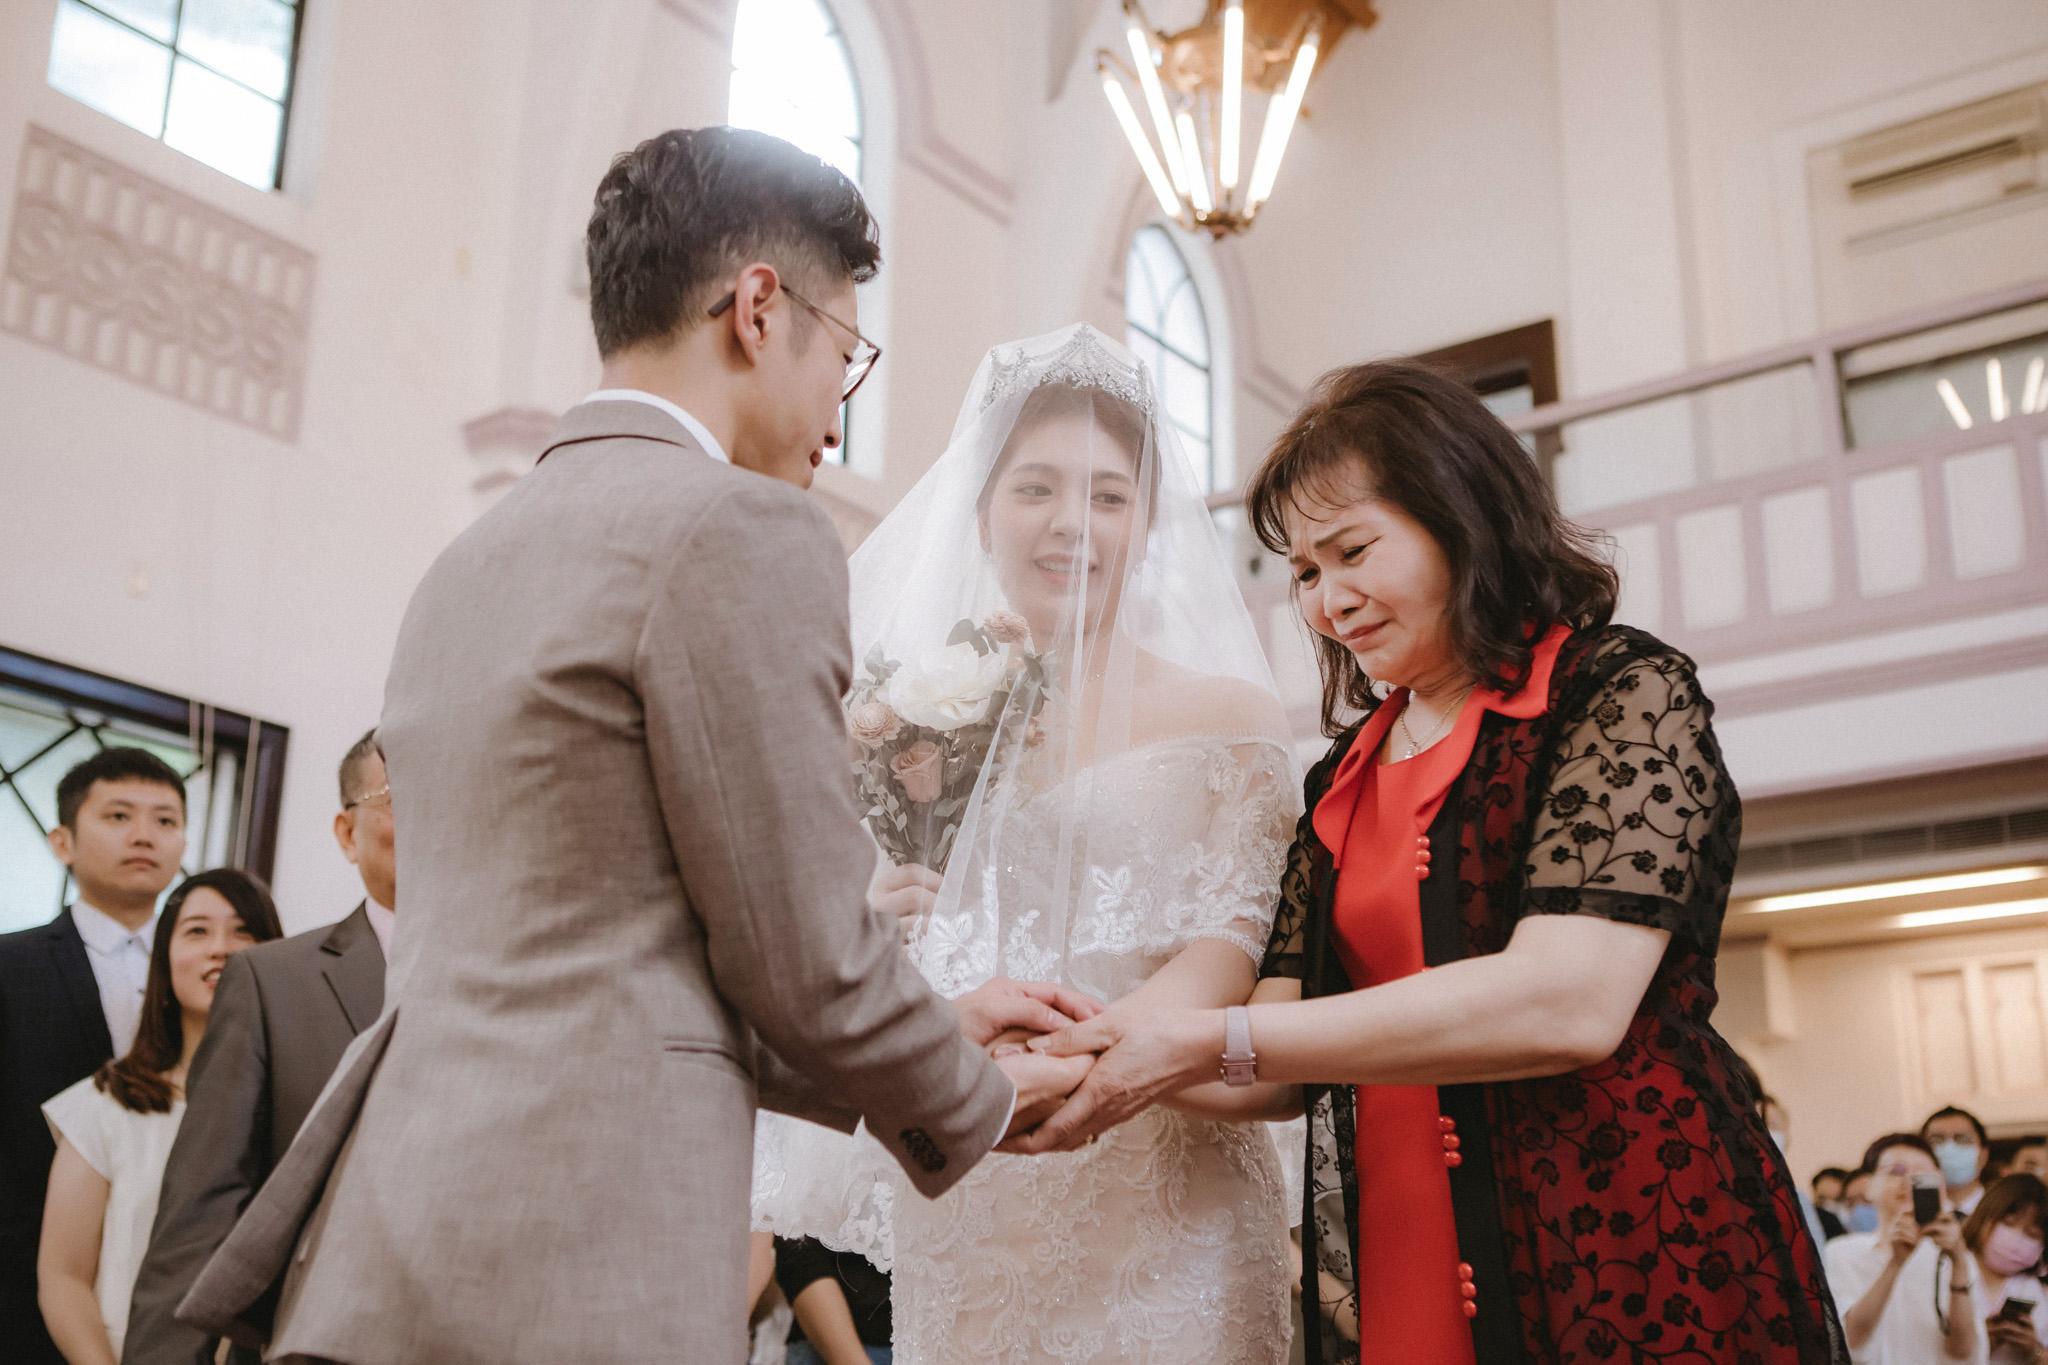 EW 台北婚攝 居米 濟南教會 Brick Yard 33 美軍俱樂部 婚禮 婚宴-26